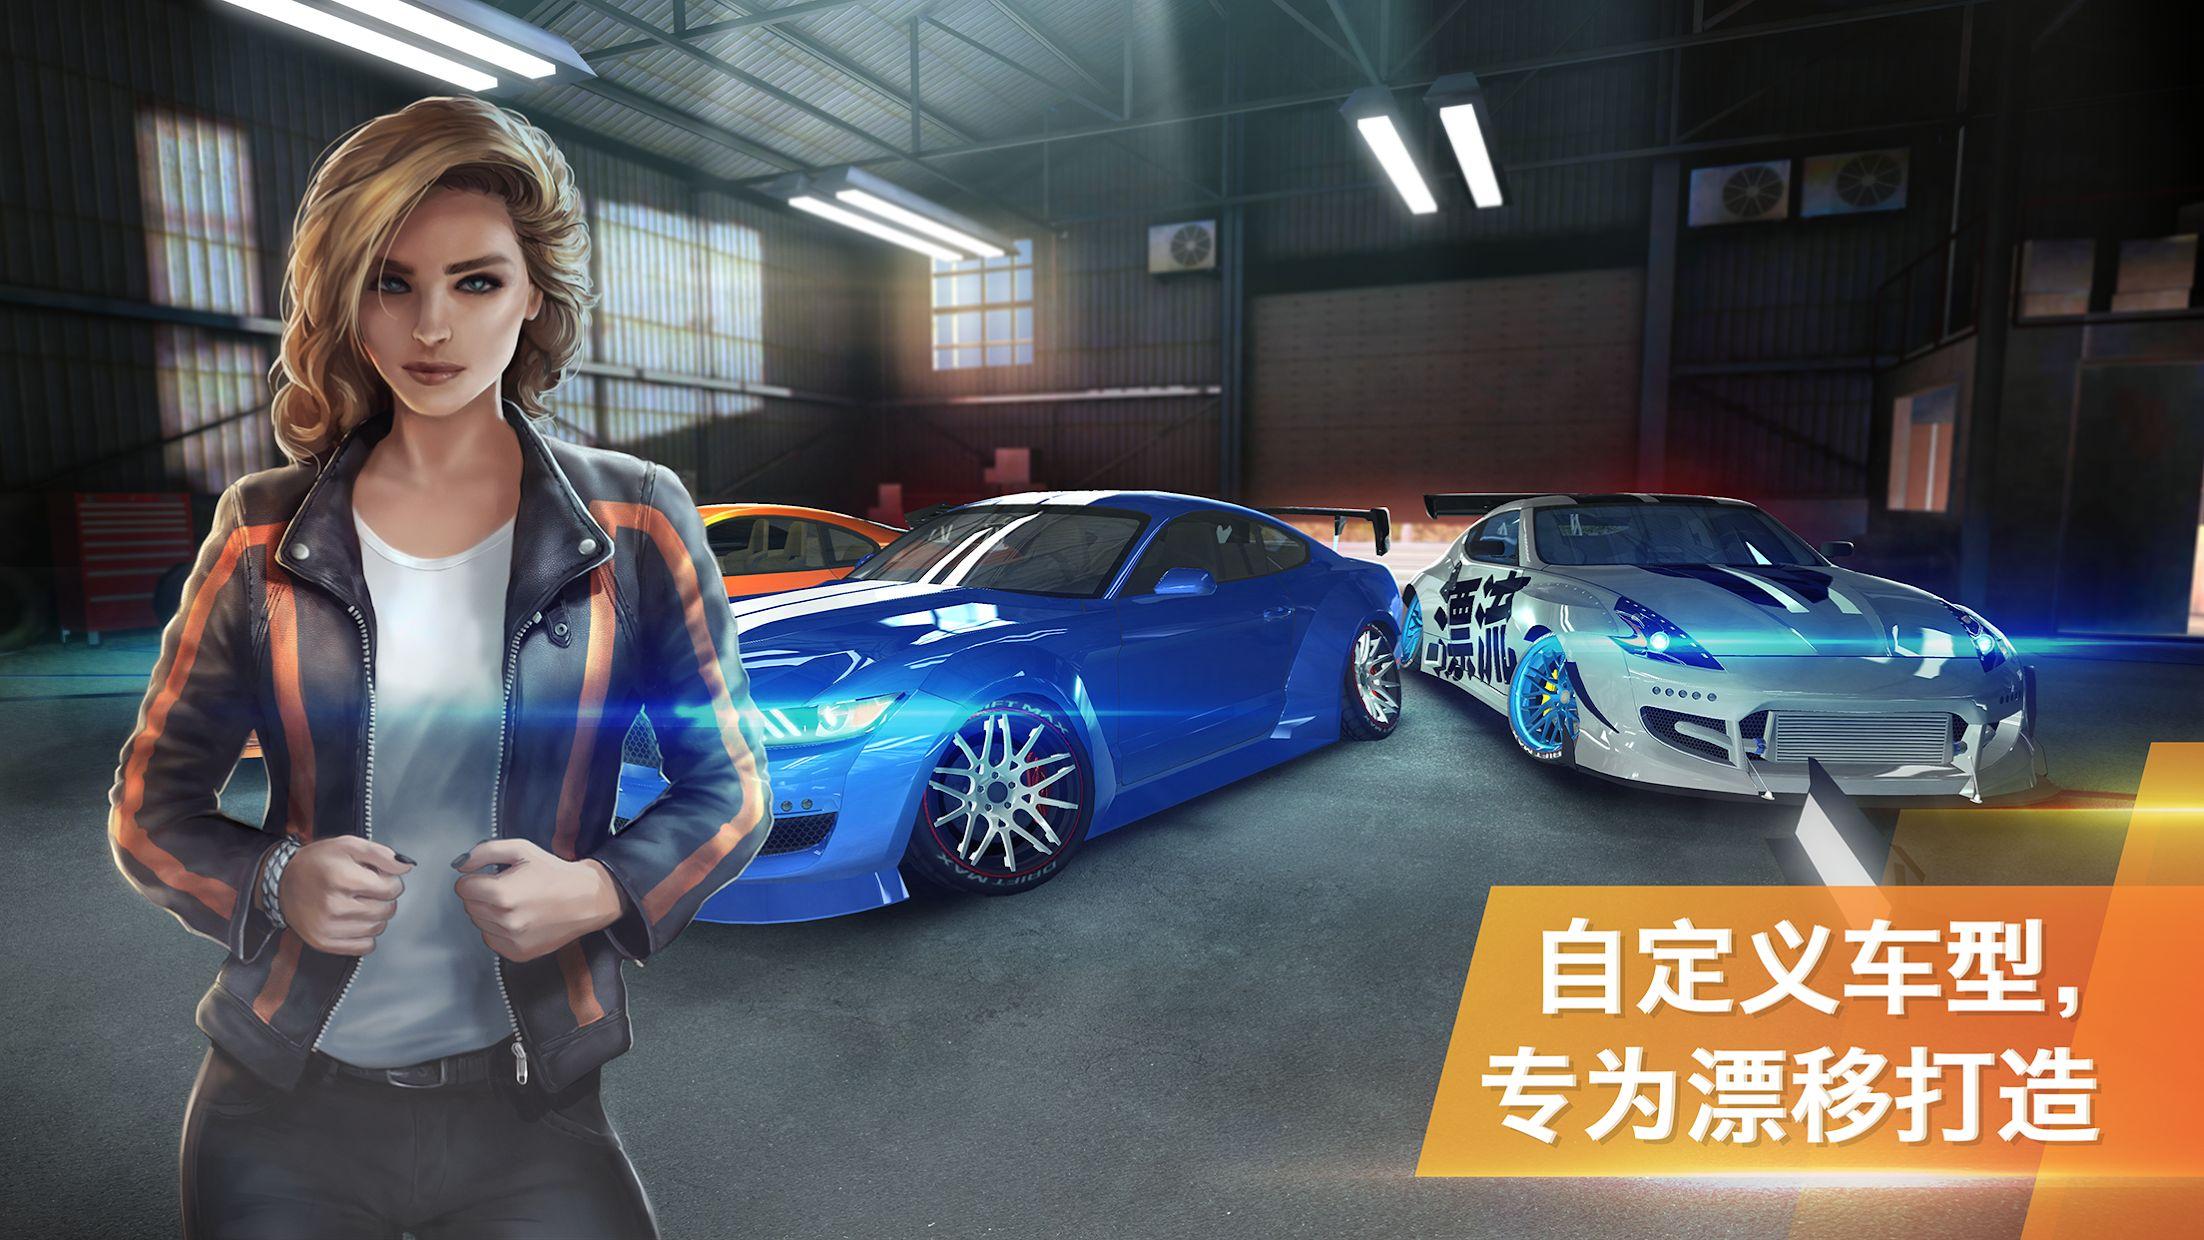 Drift Max Pro (极限漂移专家) - 赛车漂移游戏 游戏截图4